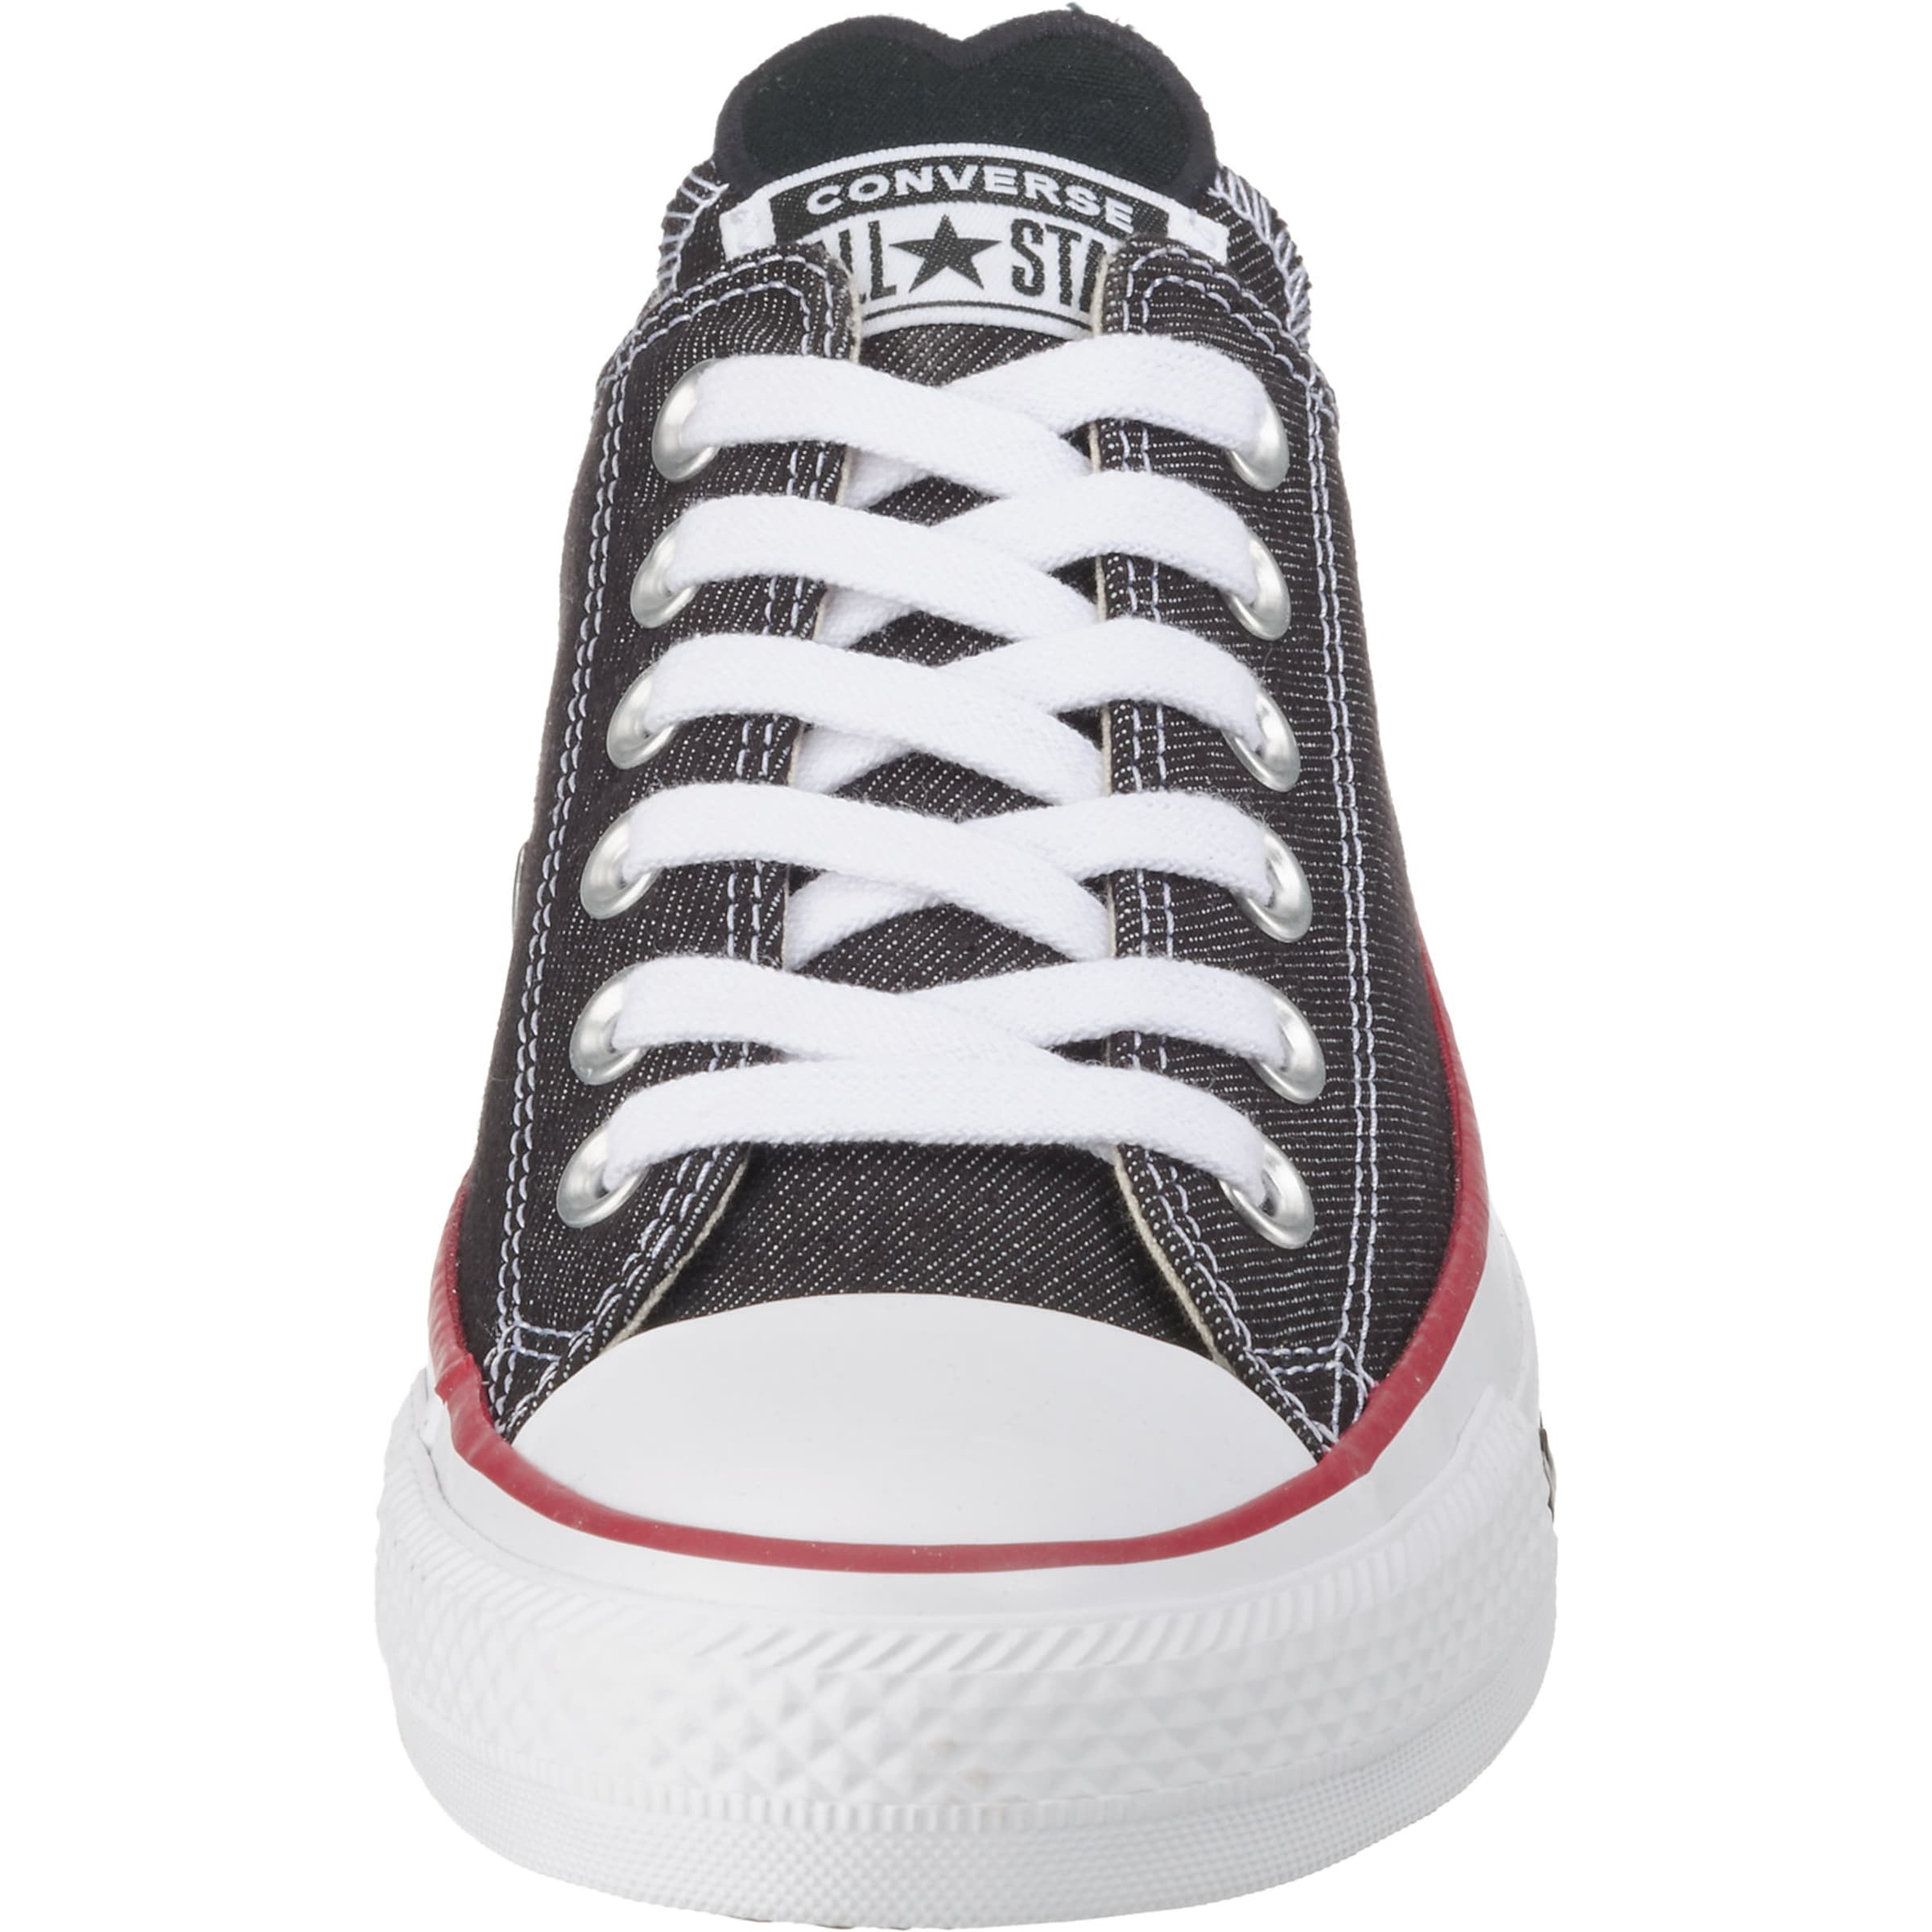 Converse Converse 'chucks' Converse DunkelgrauSchwarz Sneaker Sneaker 'chucks' Sneaker In 'chucks' In DunkelgrauSchwarz tQrdCxsh